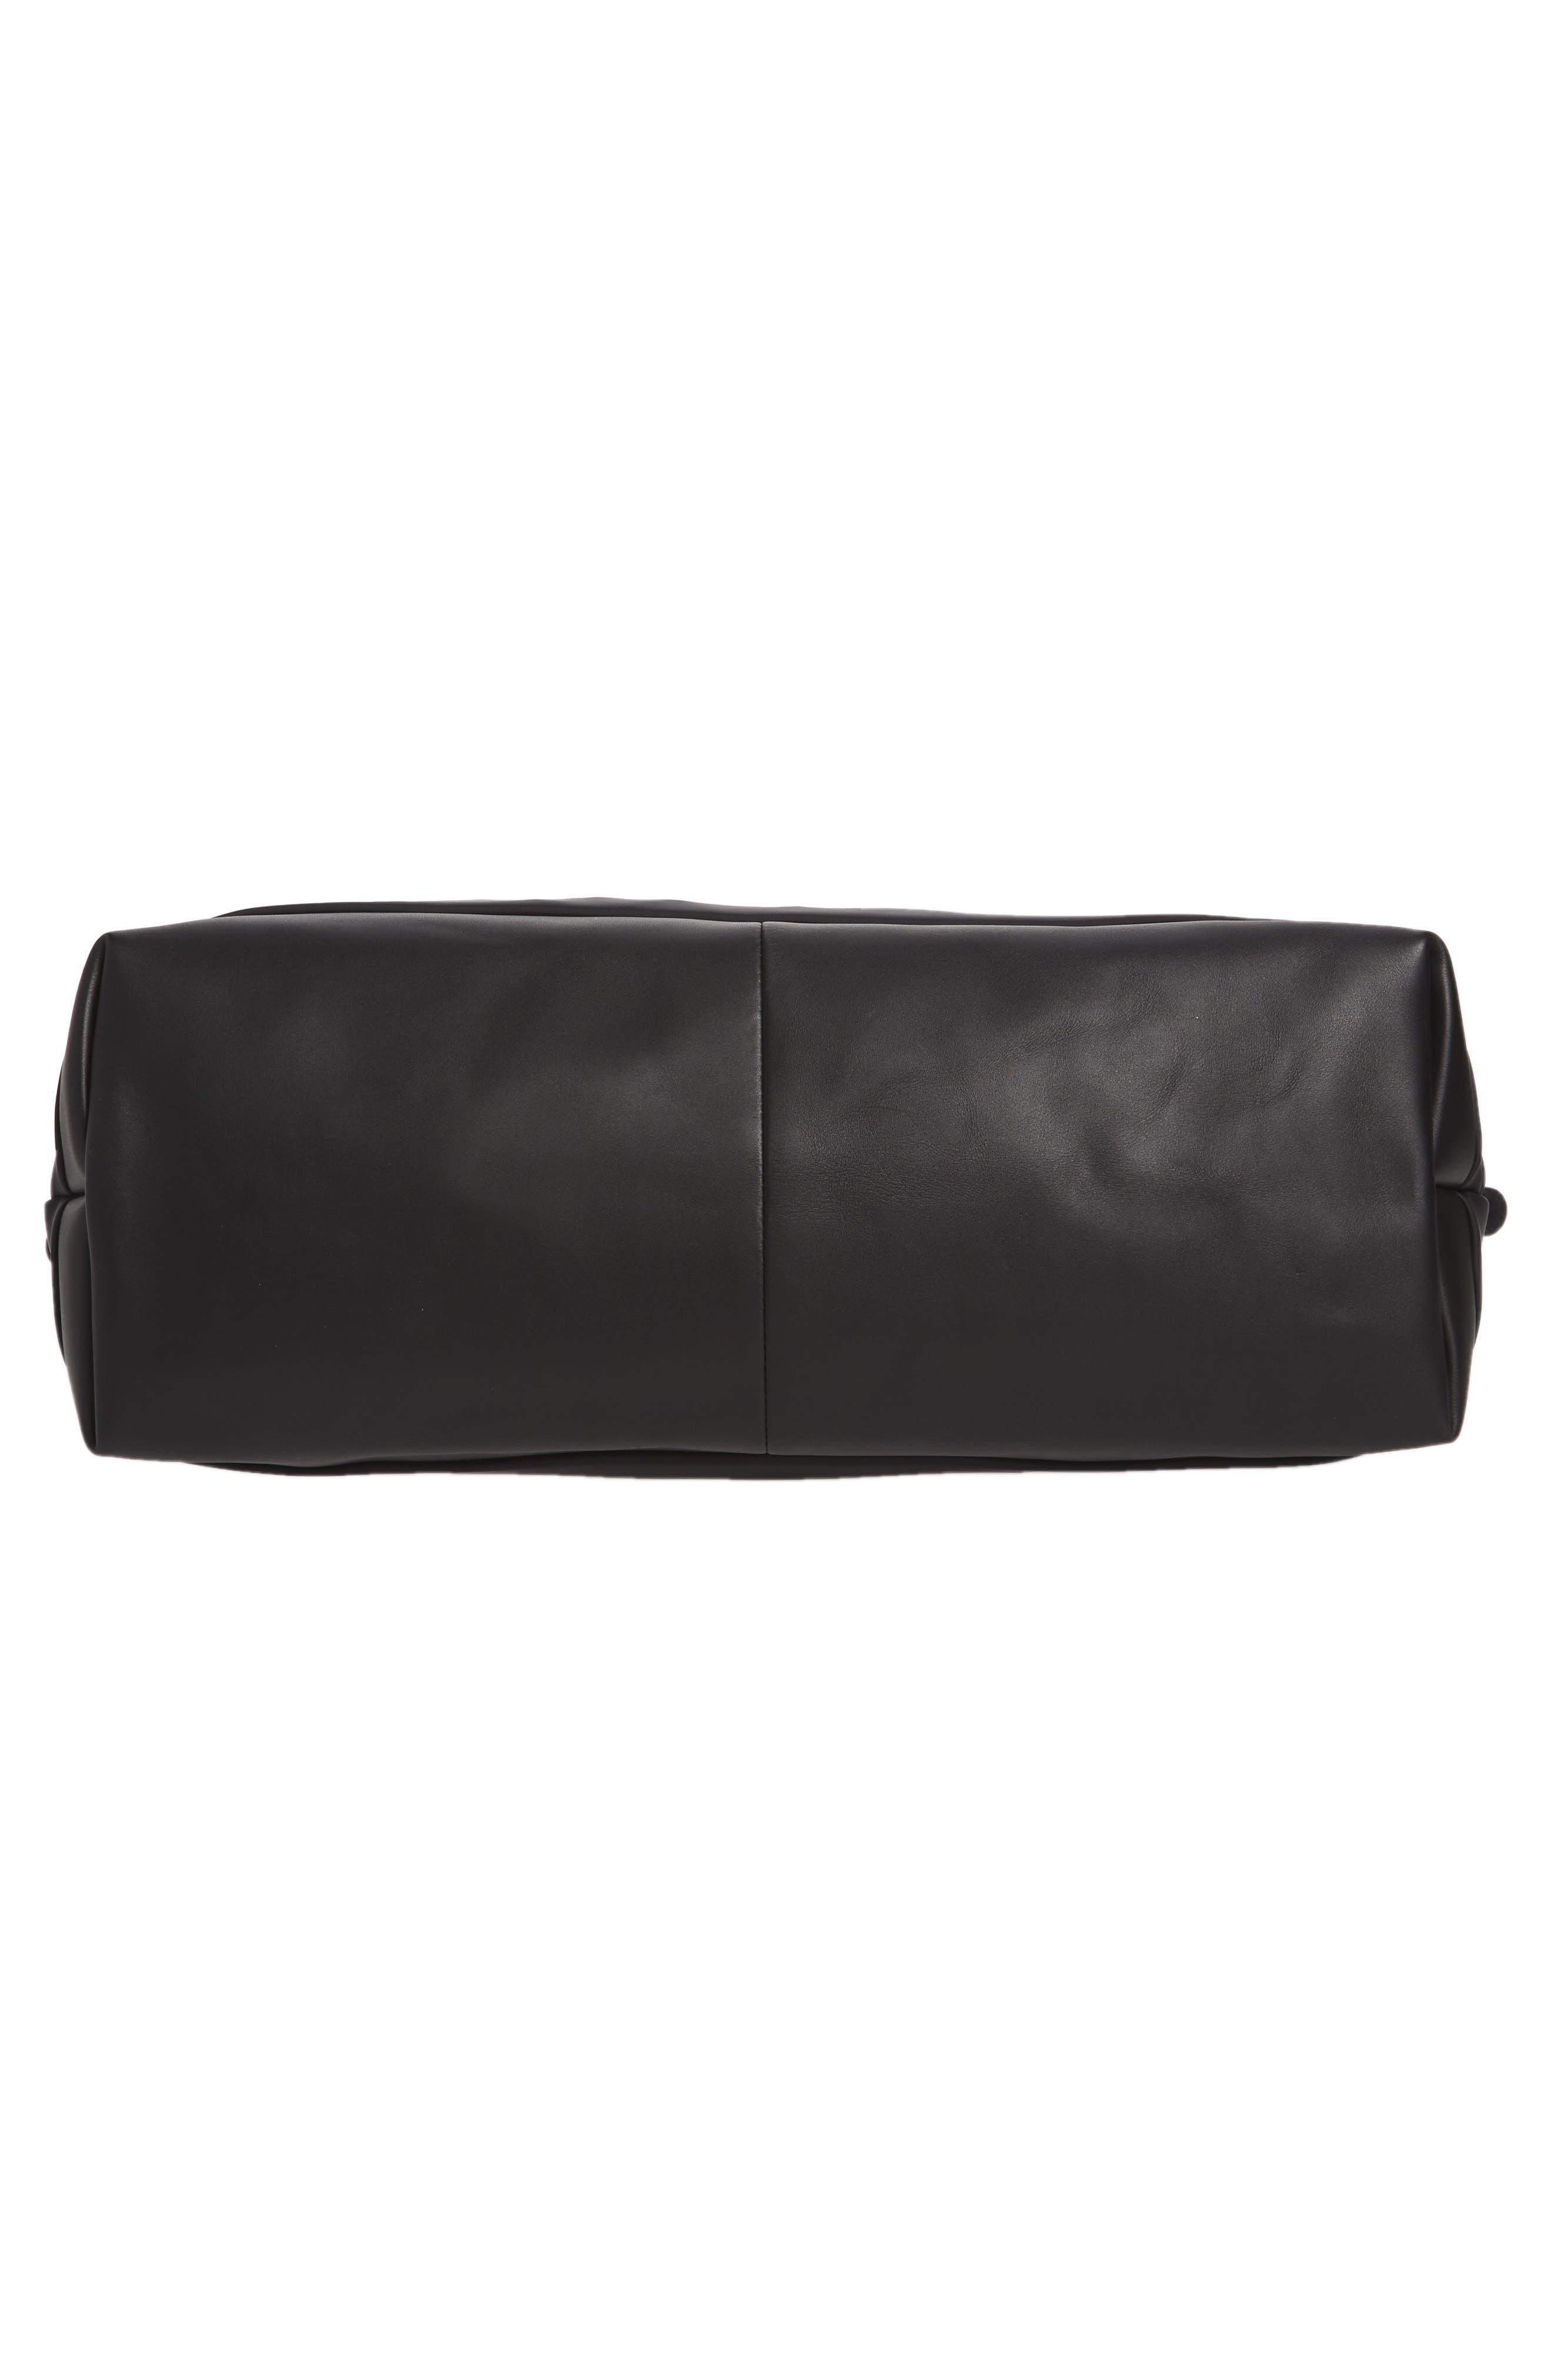 Hartsfield Nylon Tote Bag,                             Alternate thumbnail 6, color,                             Black Nylon